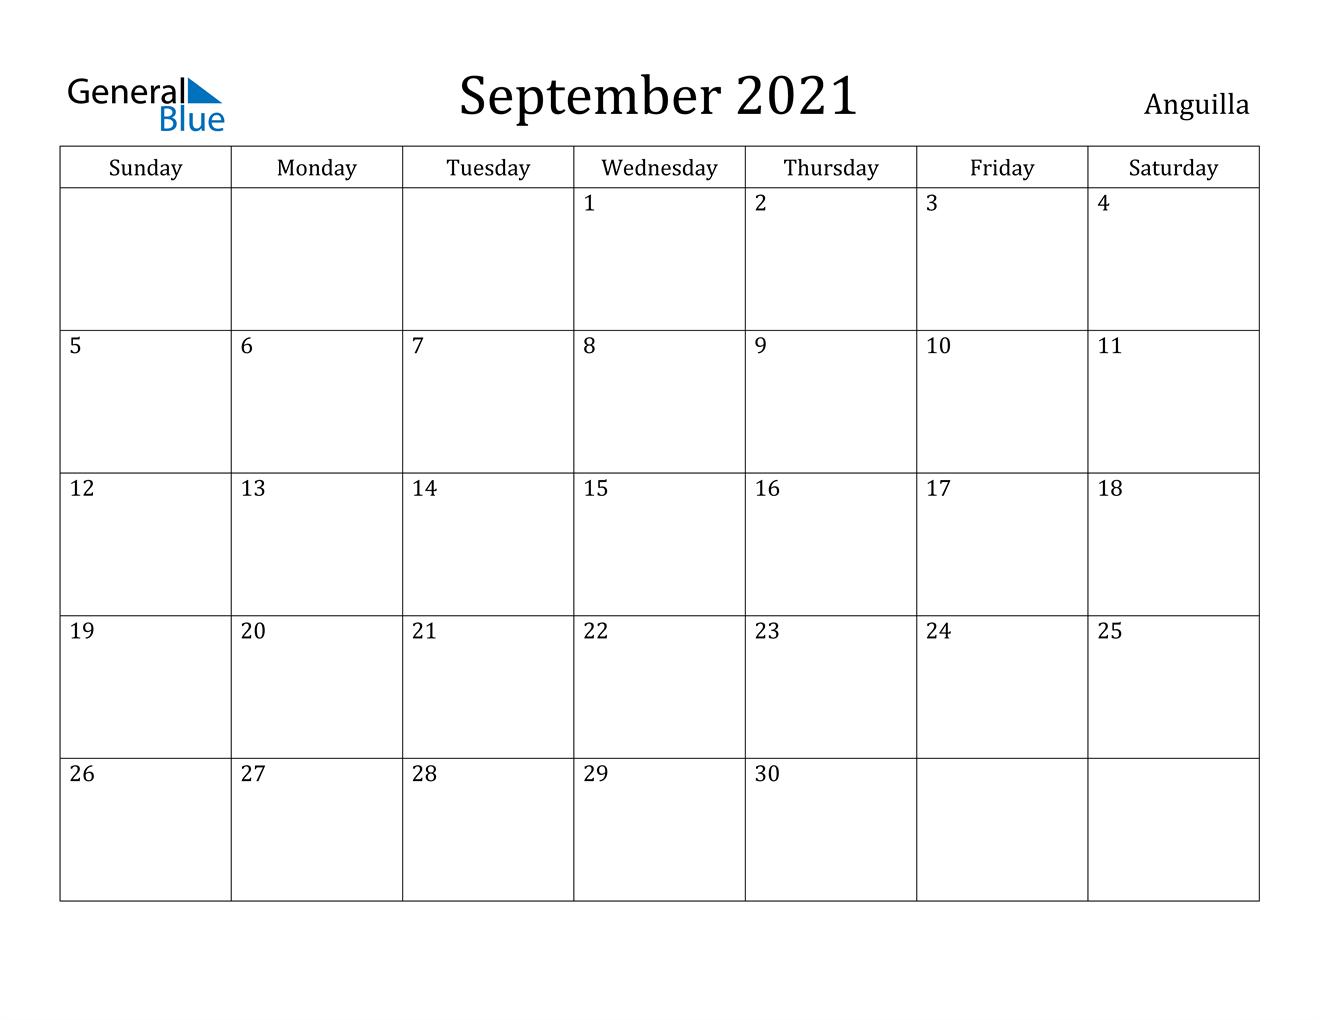 September 2021 Calendar - Anguilla